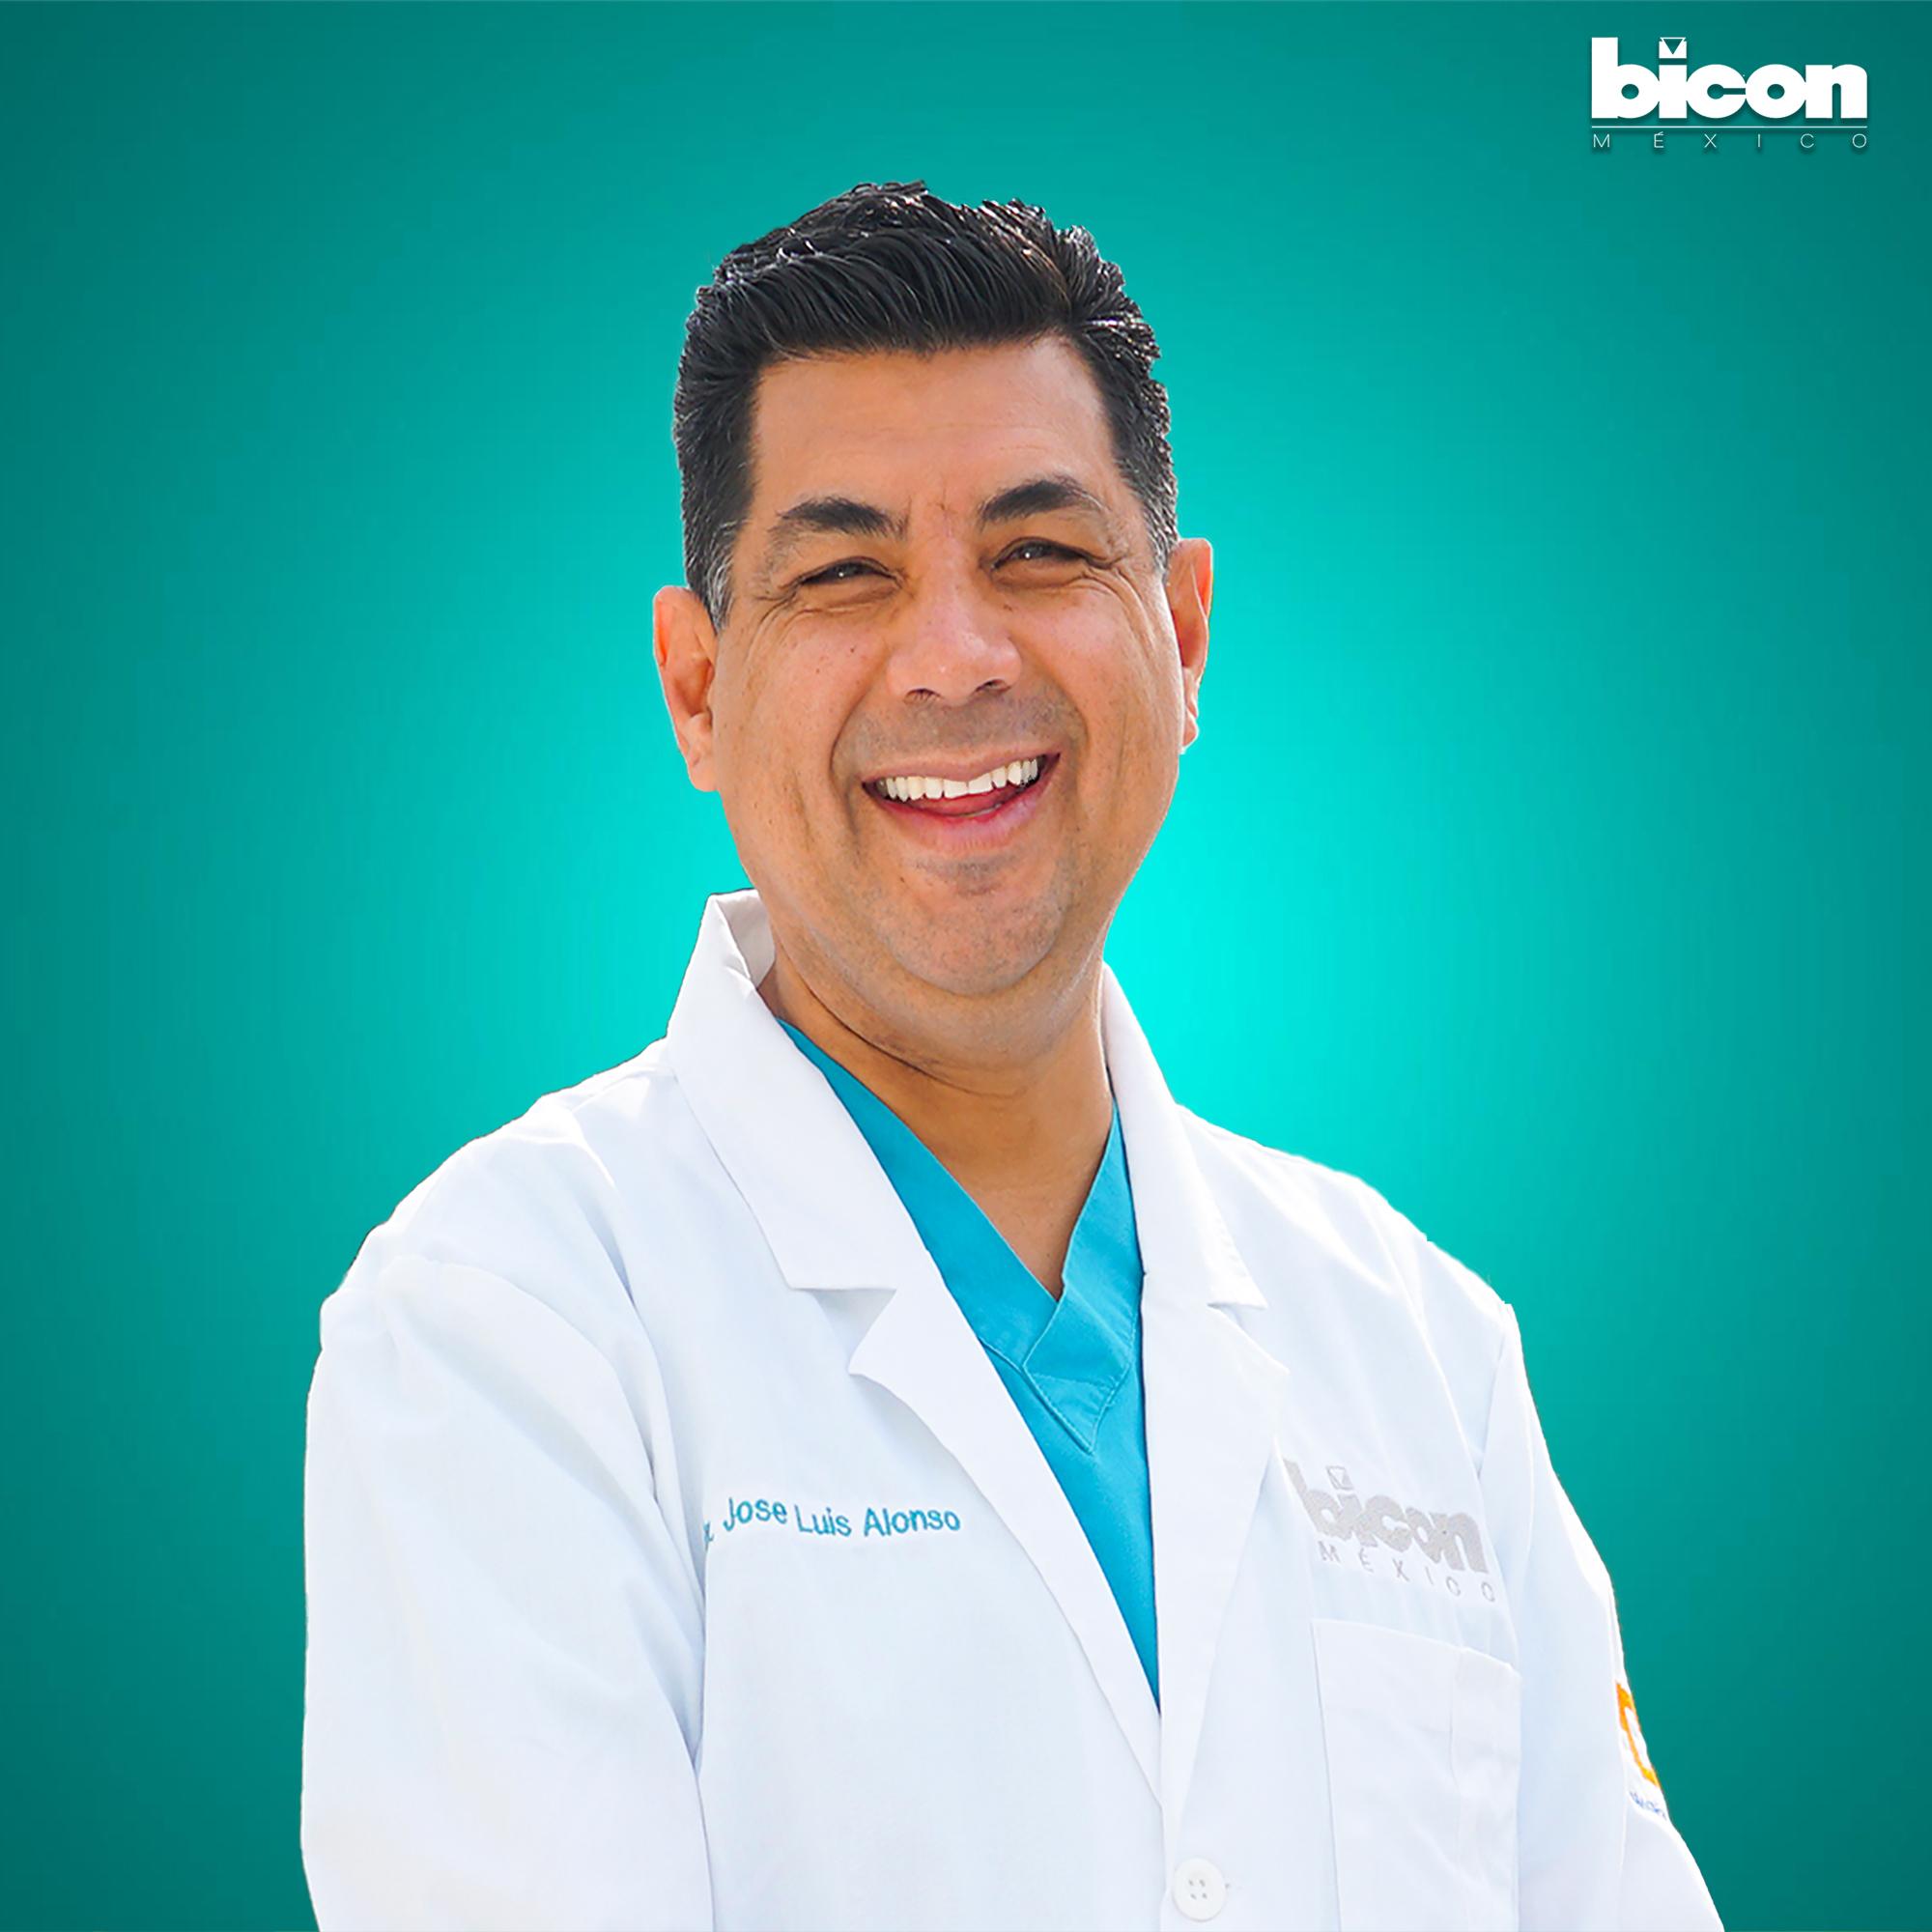 https://mexicoimplantdentistry.com/wp-content/uploads/2021/04/Jose-Luis-Alonso-1.jpg